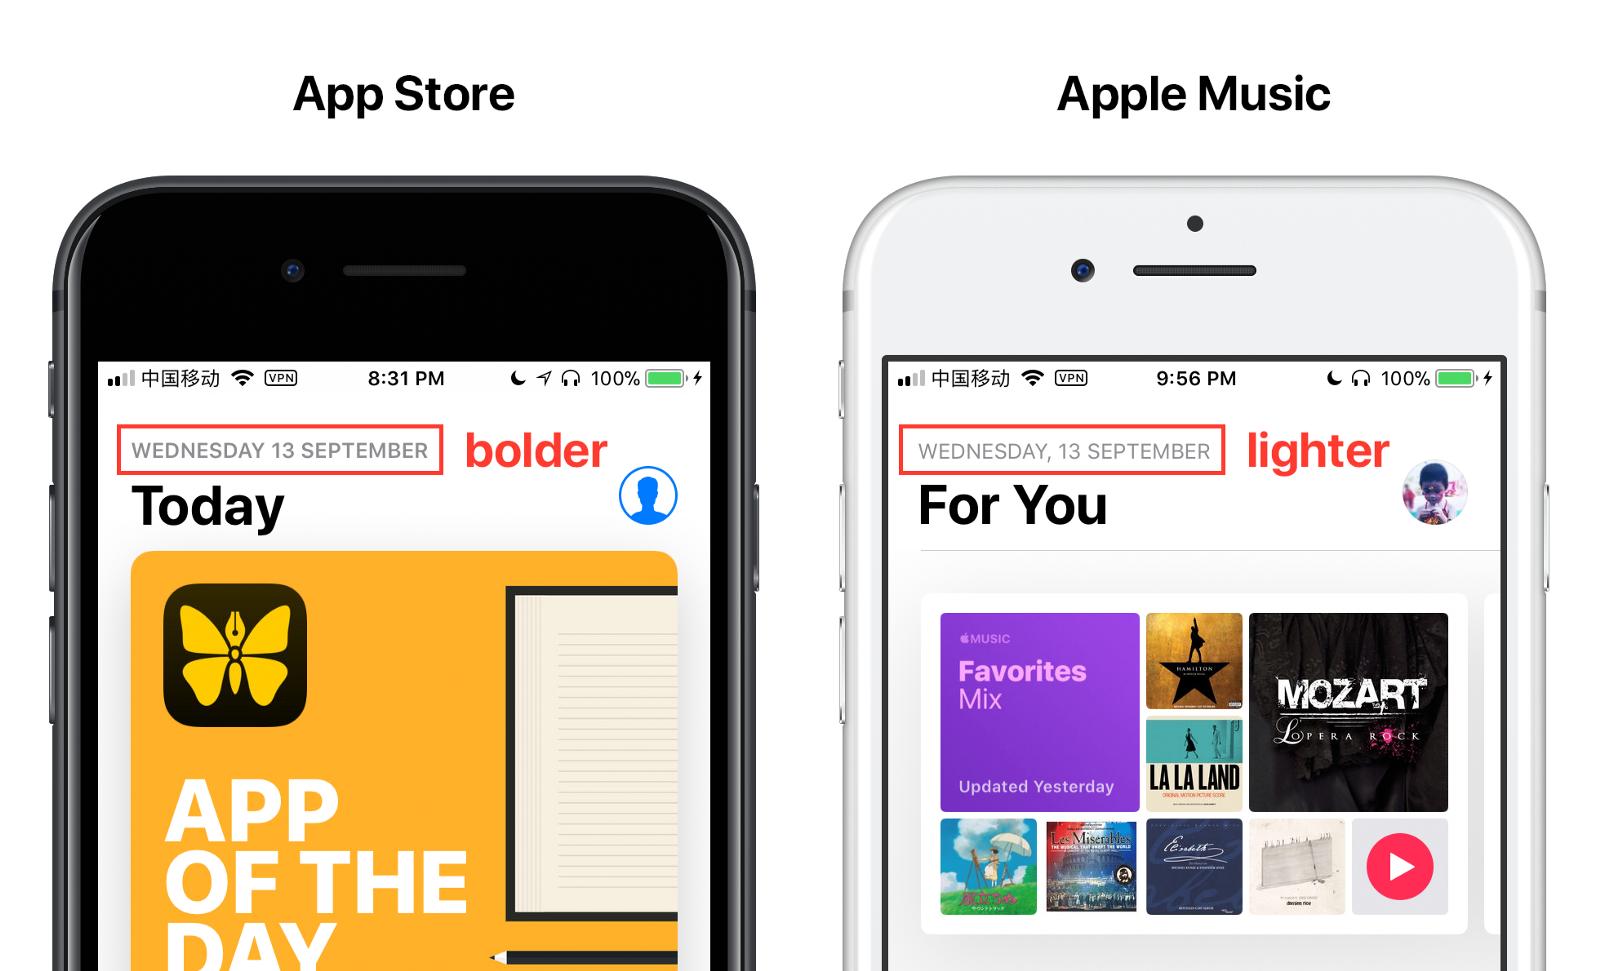 Дизайнер разнес iOS 11 в пух и прах с примерами на фото и видео